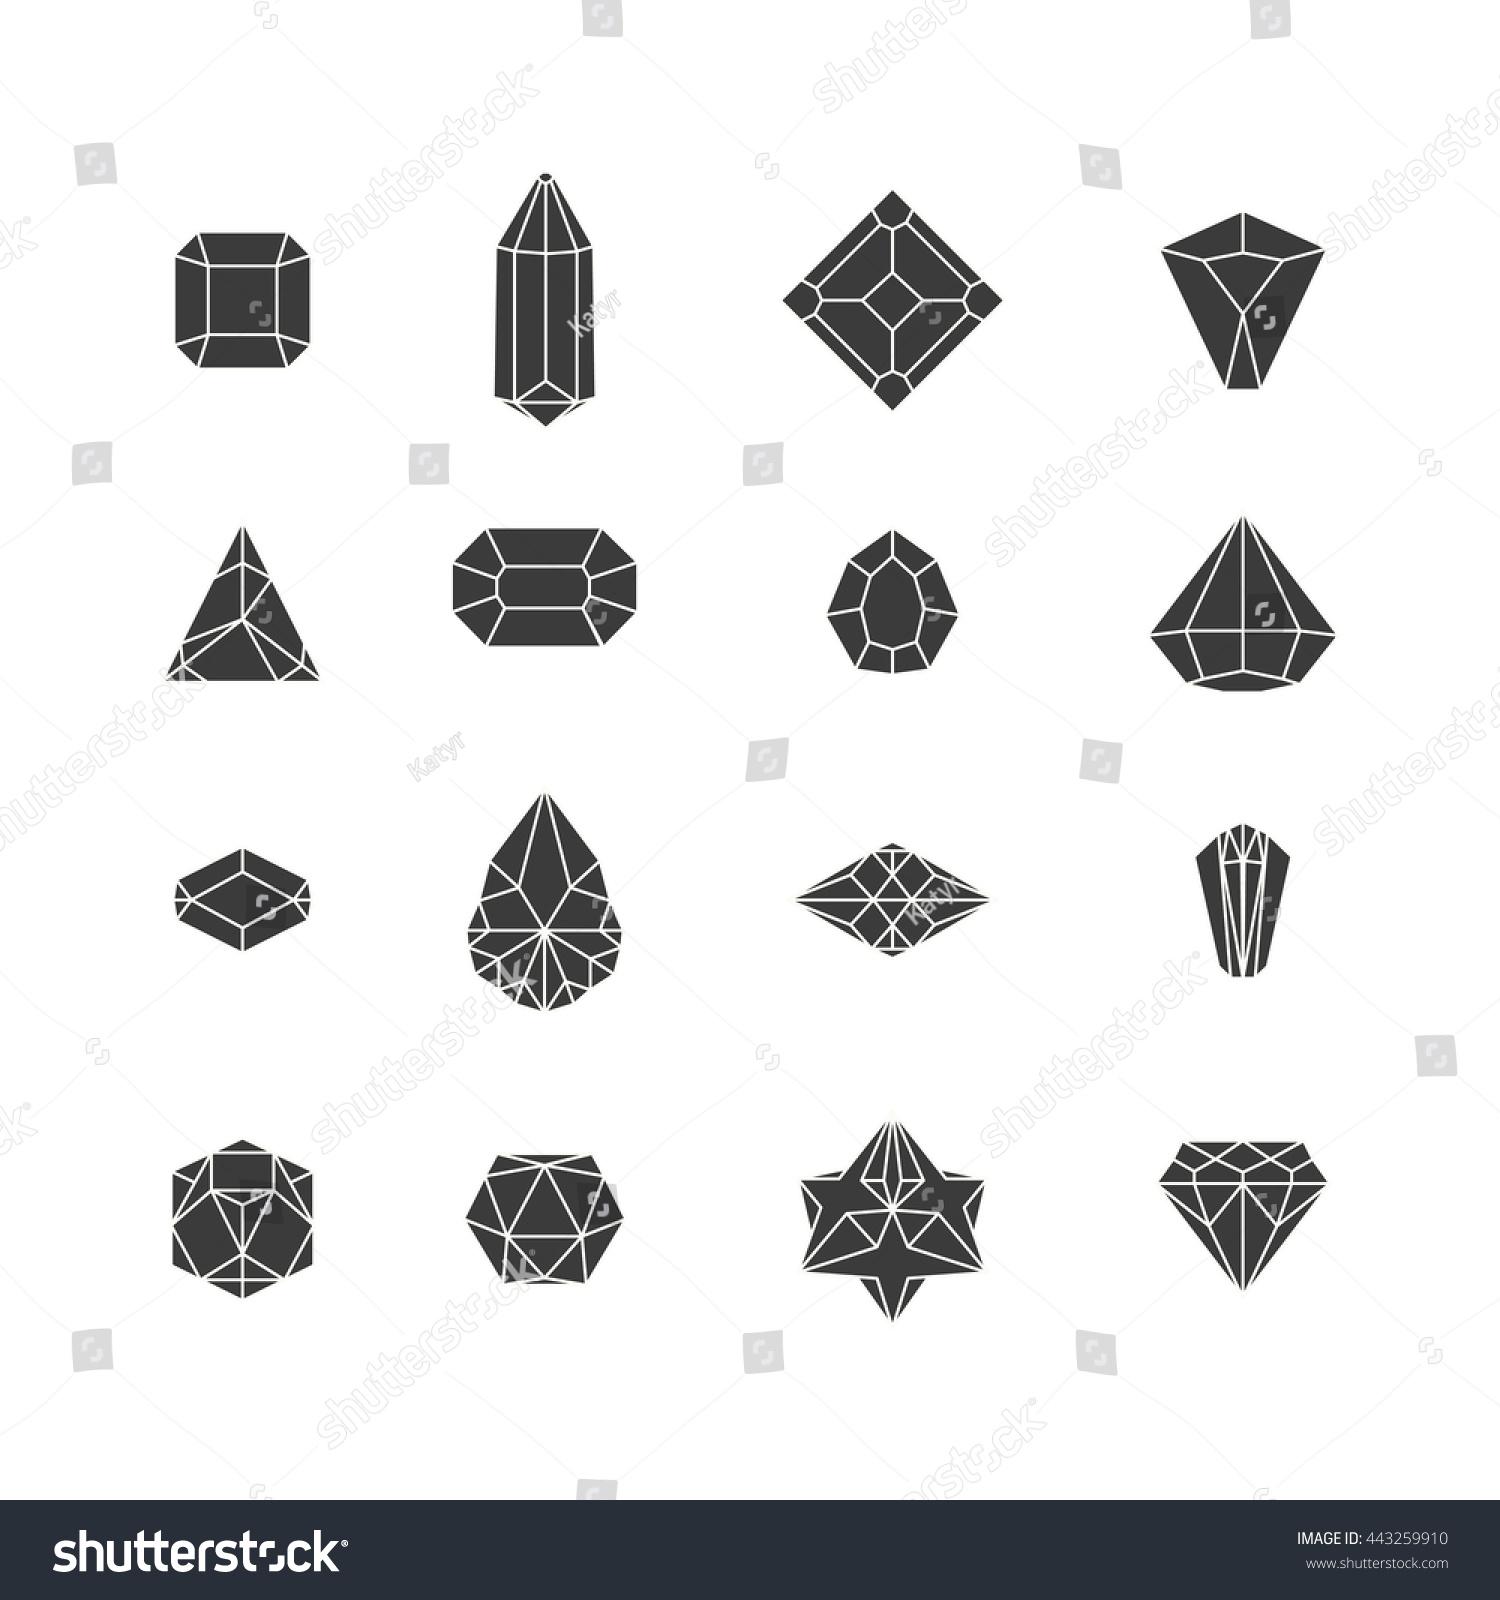 Vector Illustration Crystal Icons Design Website Stock Vector ...